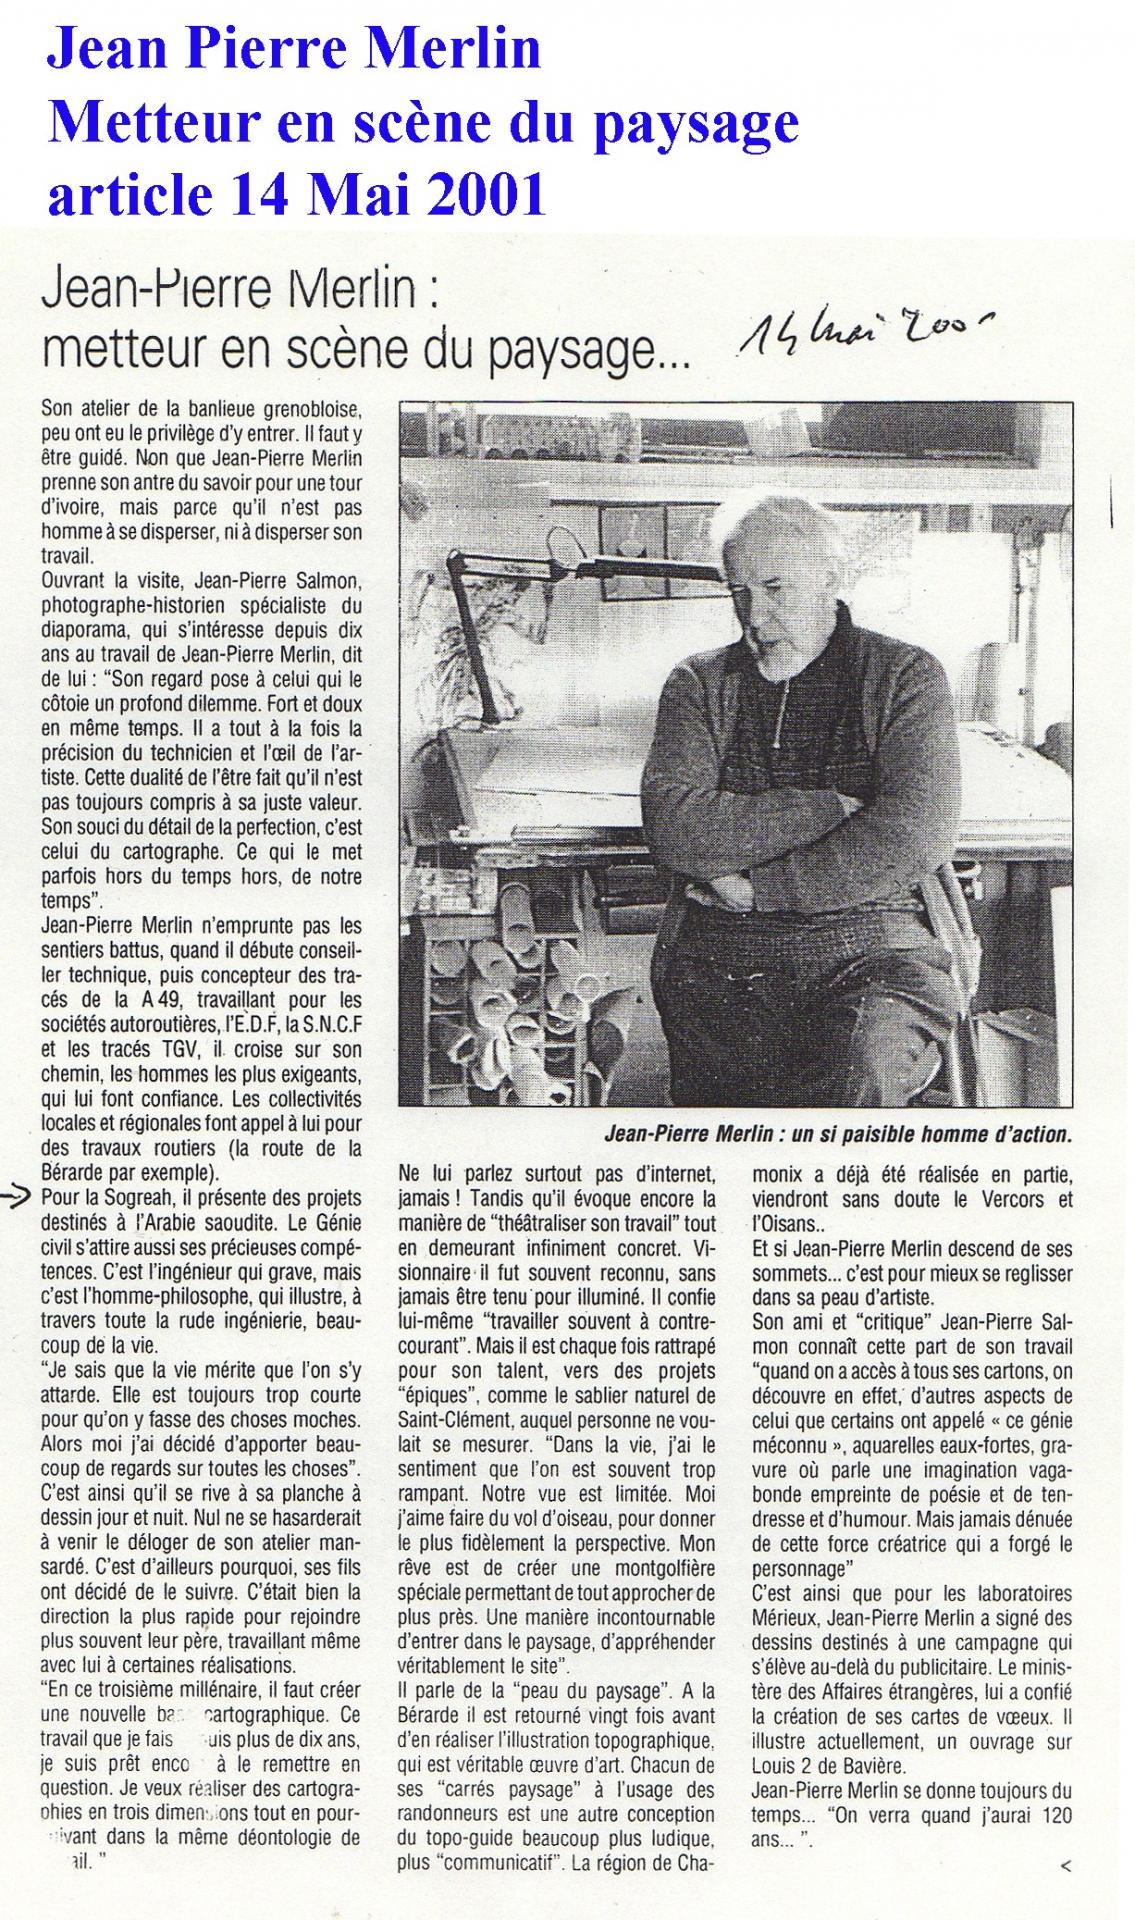 Merlin jean pierre presse 14 mai 2001 bords